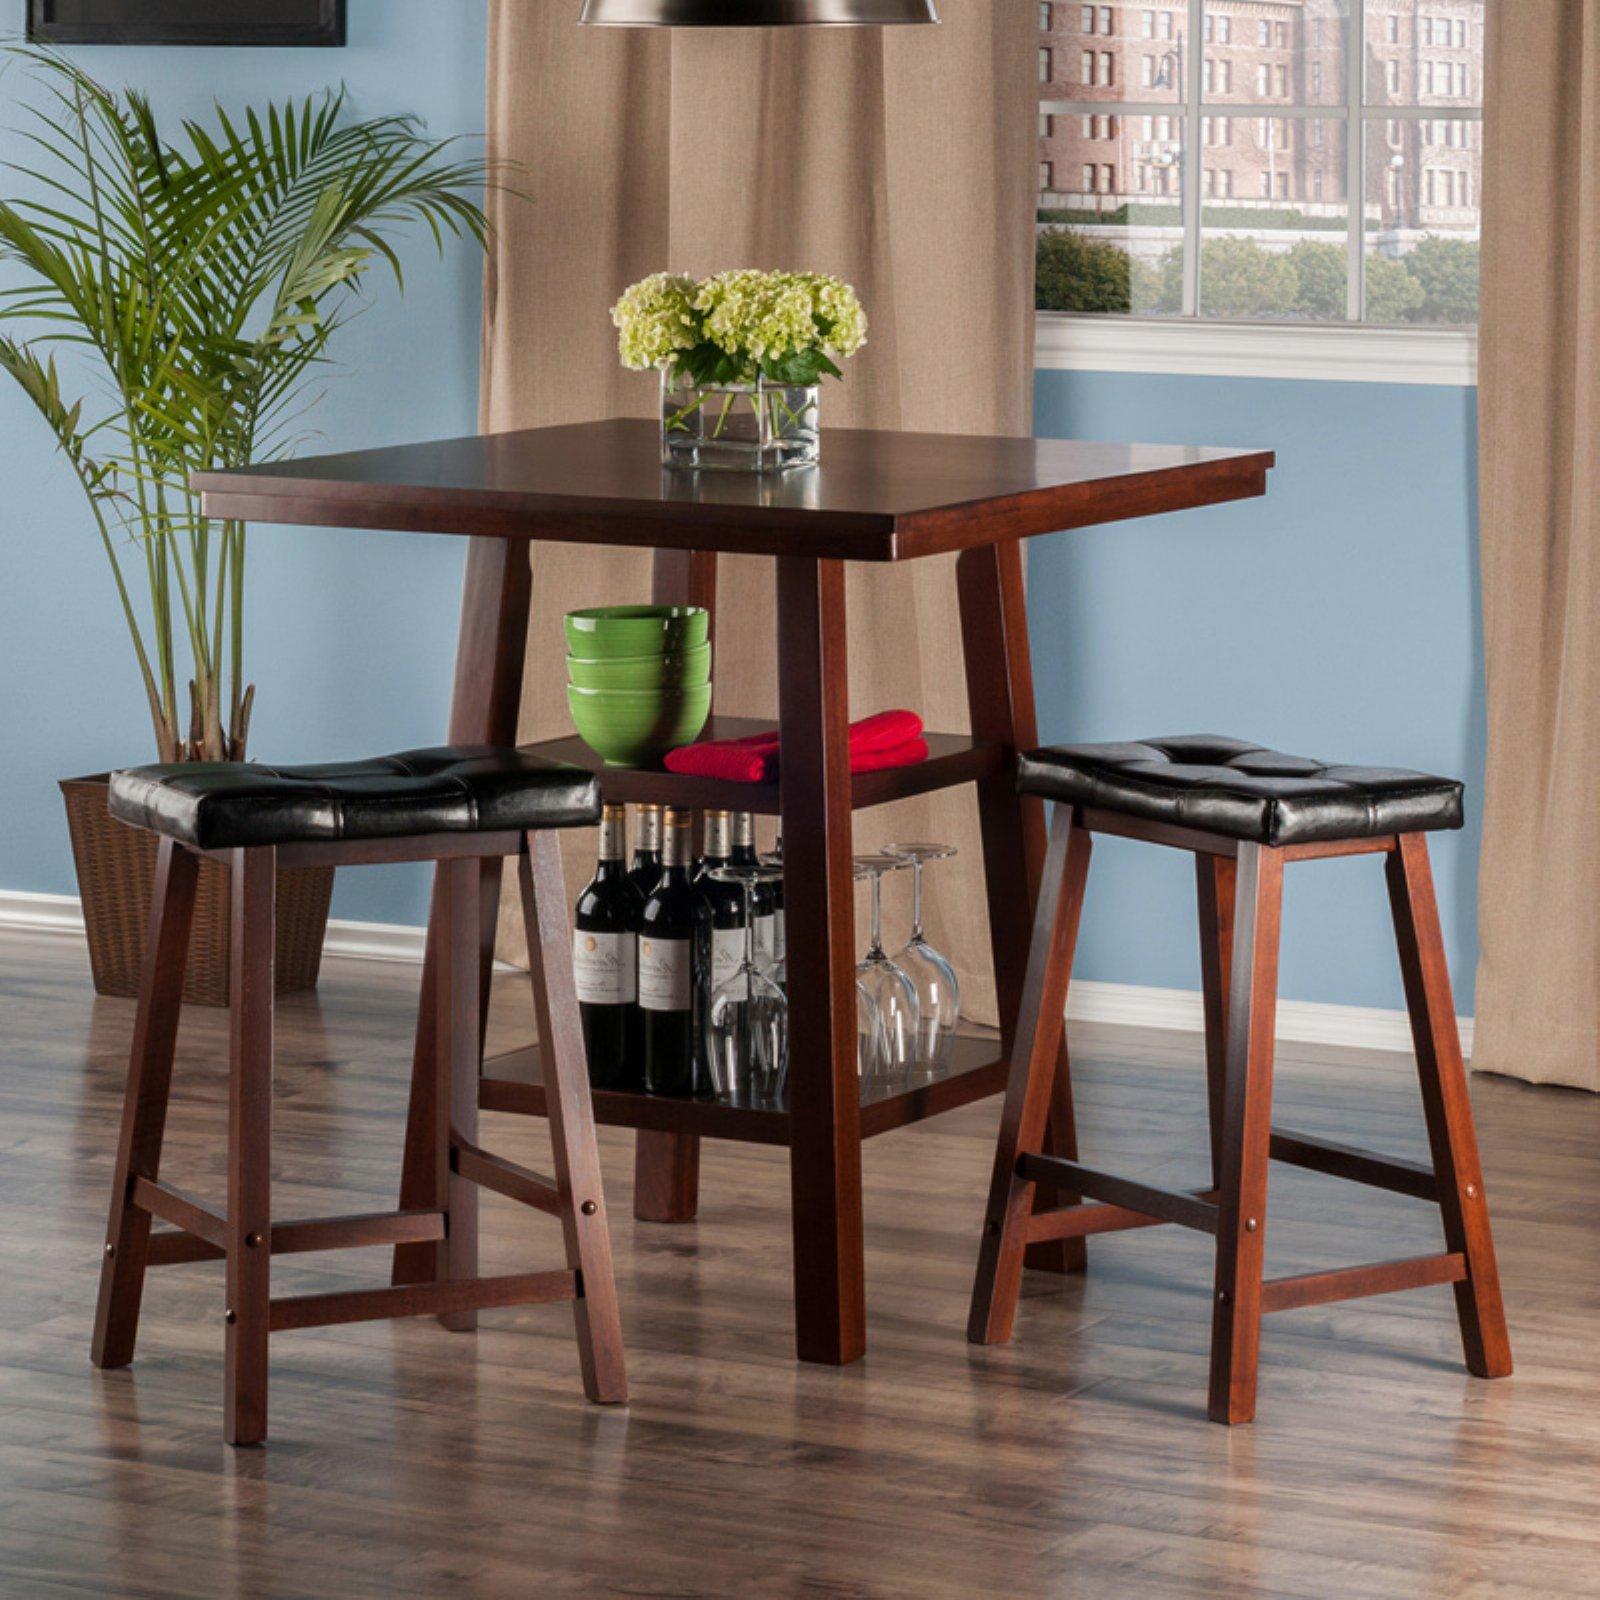 Orlando 3-Pc Set High Table, 2 Shelves w/ 2 Cushion Seat Stools